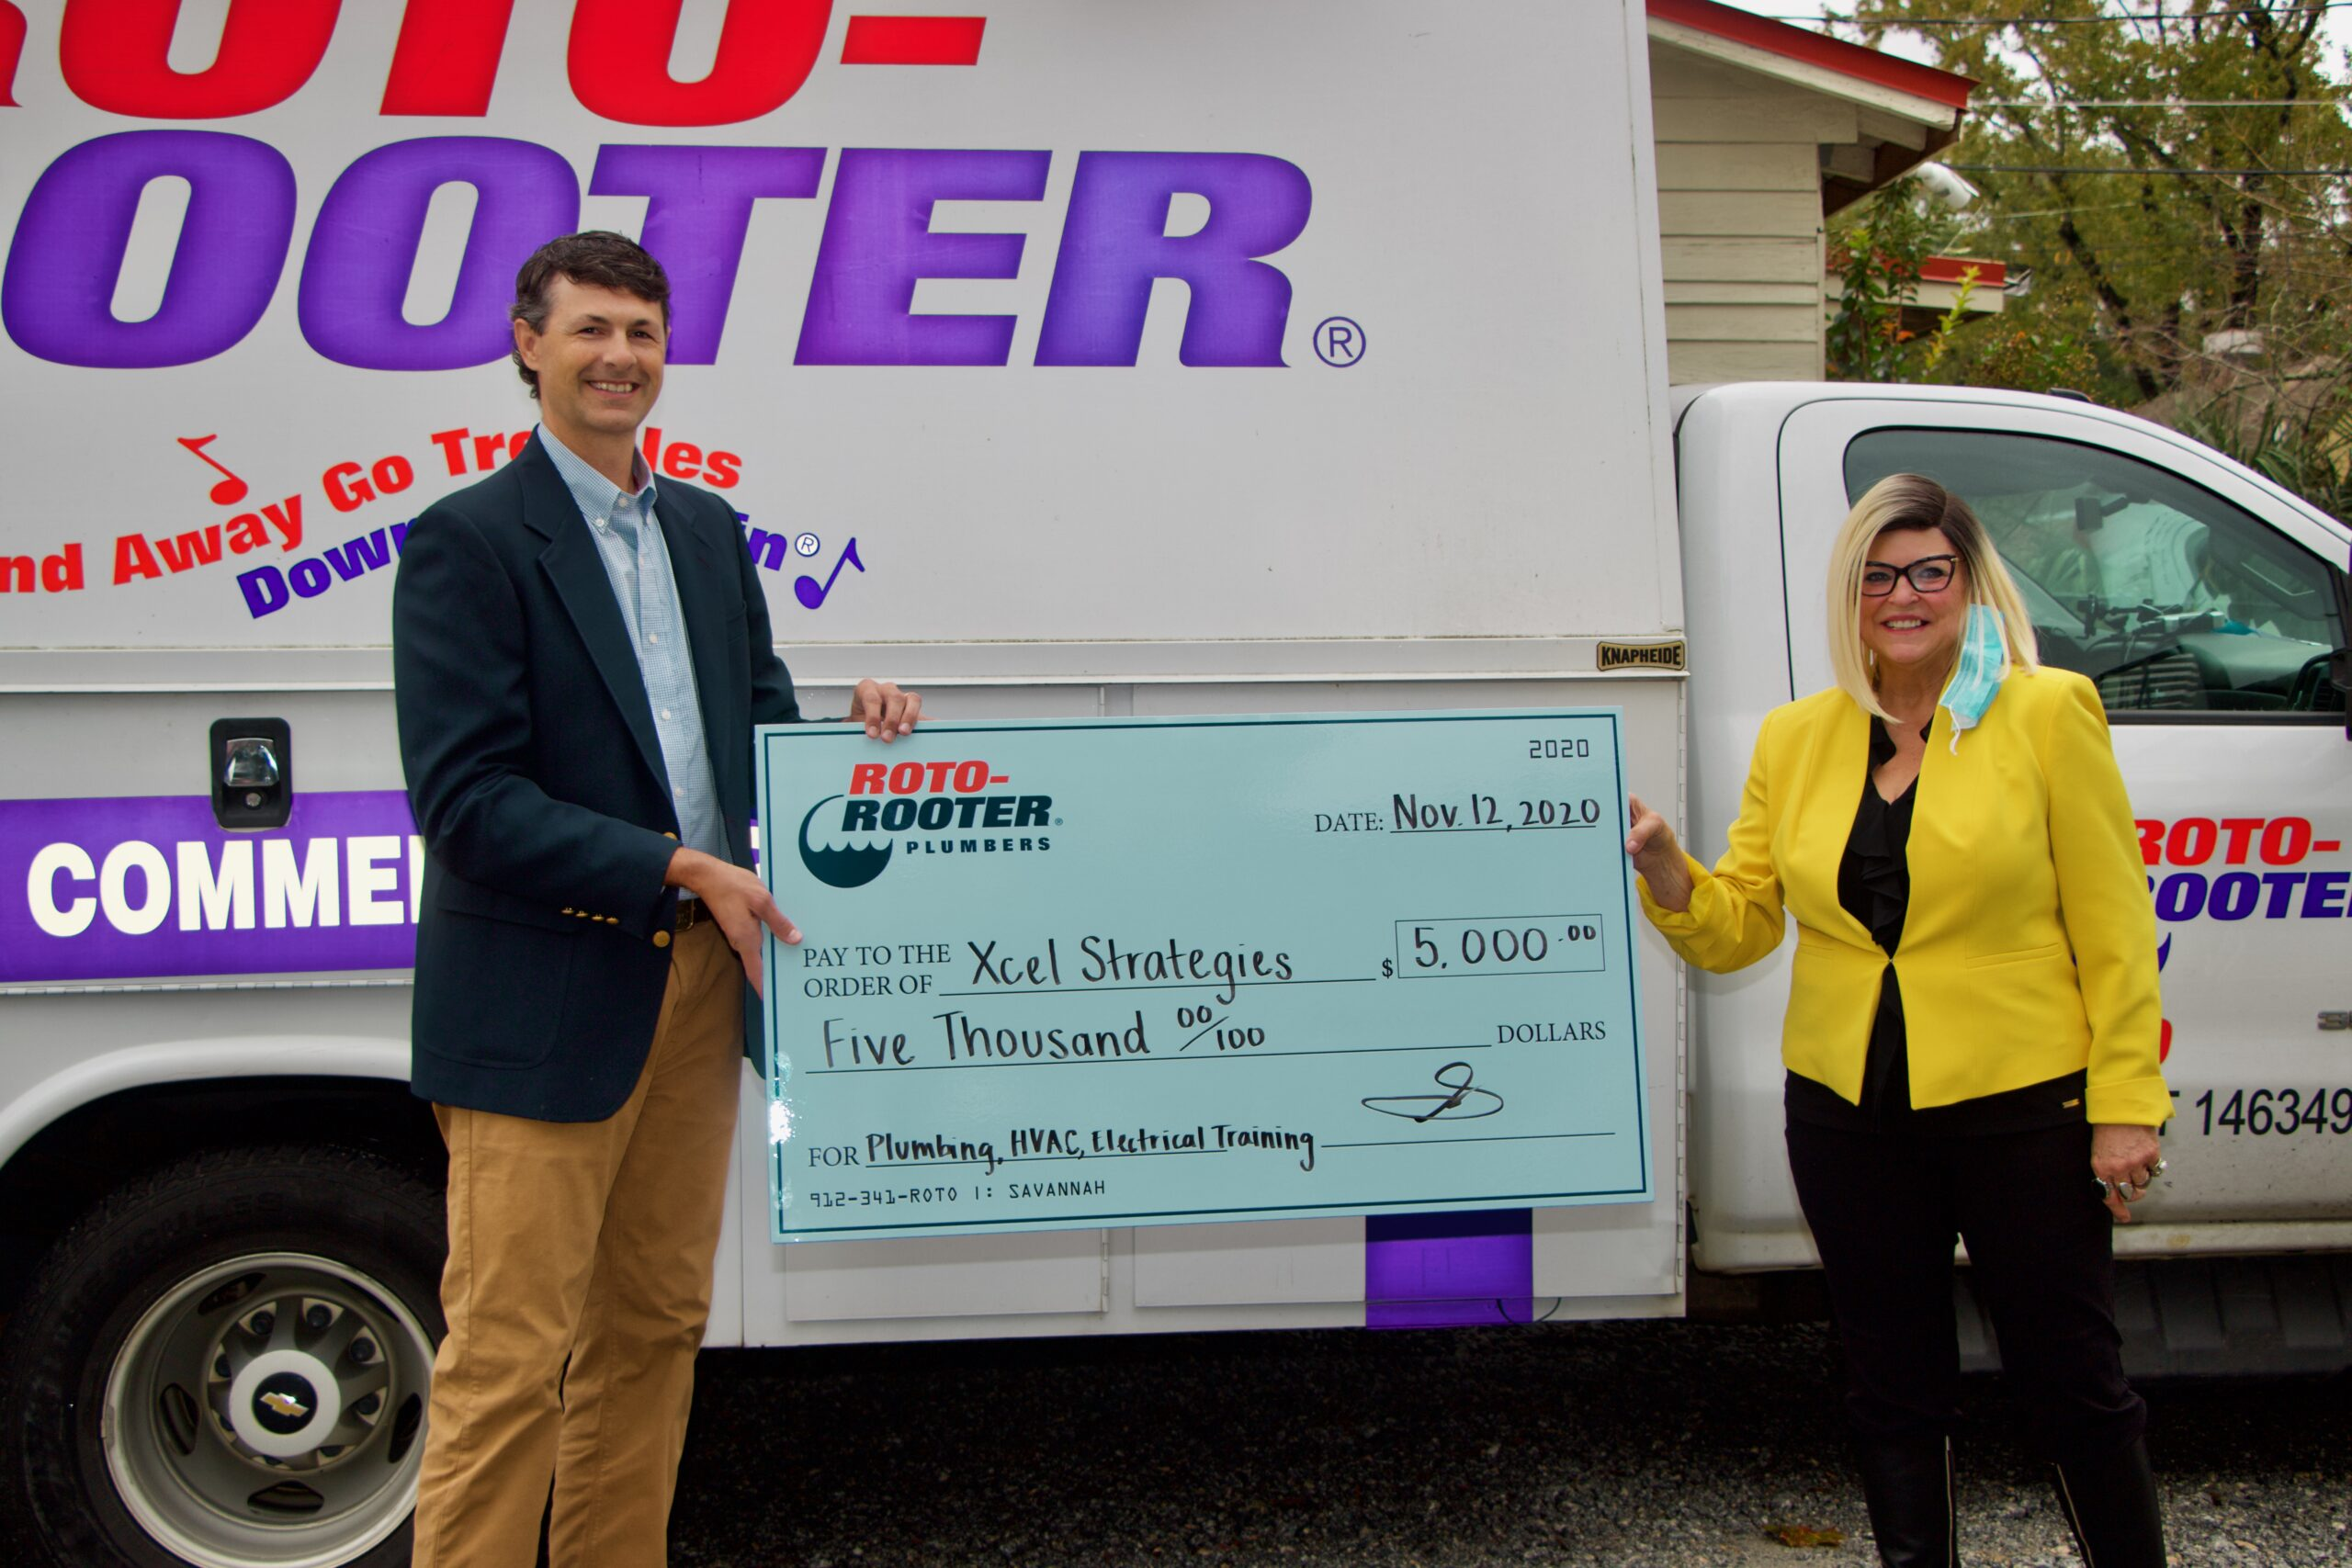 Roto-Rooter of Savannah Supports Xcel Strategies Mentoring Program